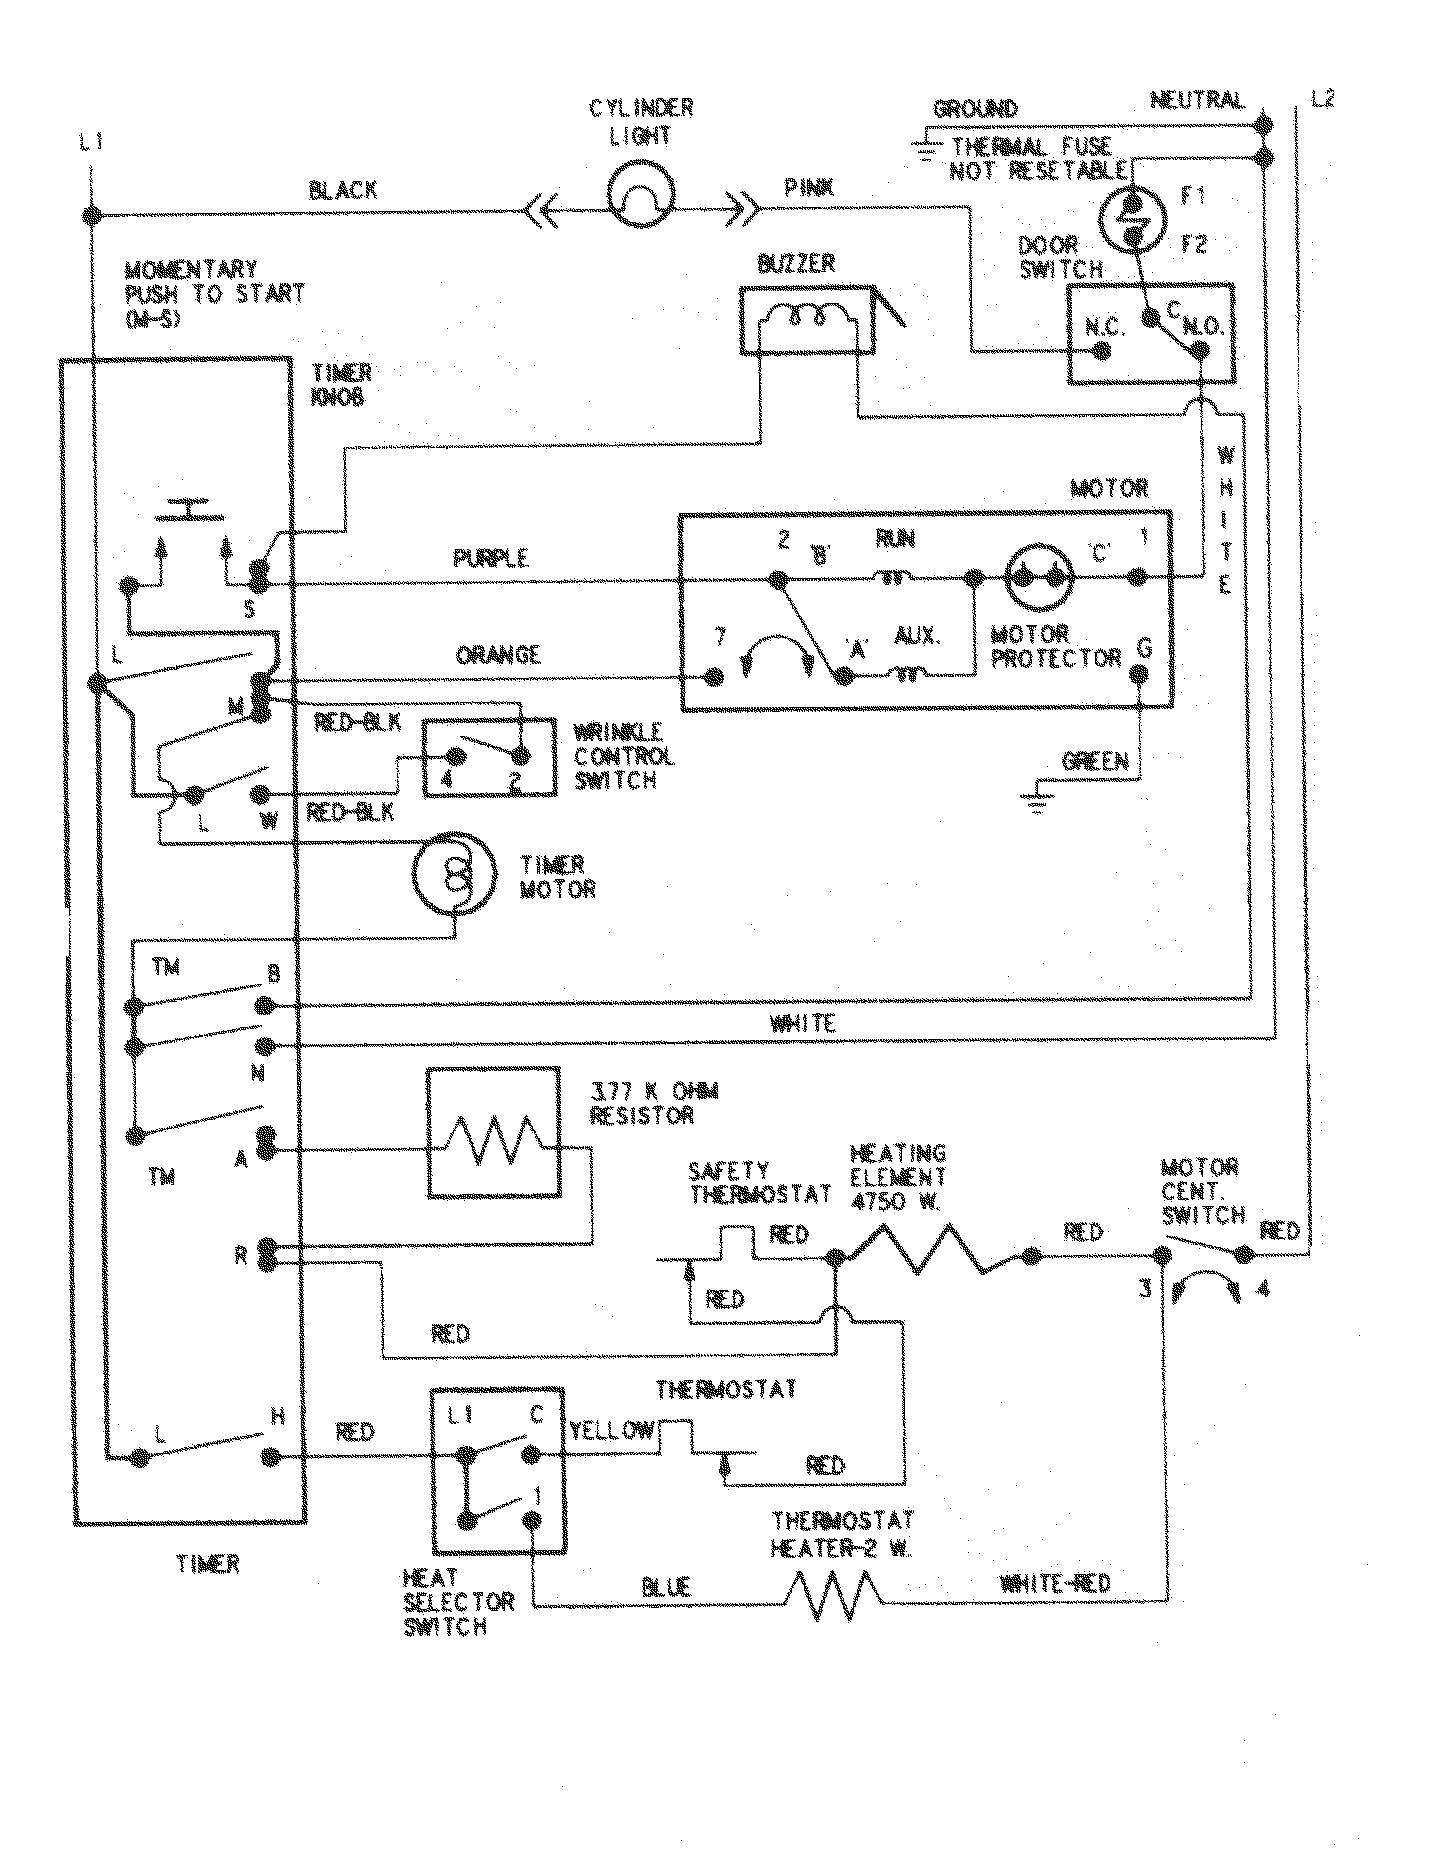 [DIAGRAM_38DE]  8E0EC Magic Chef Gas Furnace Control Wiring Diagram | Wiring Library | Wiring Diagram Heat Magic |  | Wiring Library